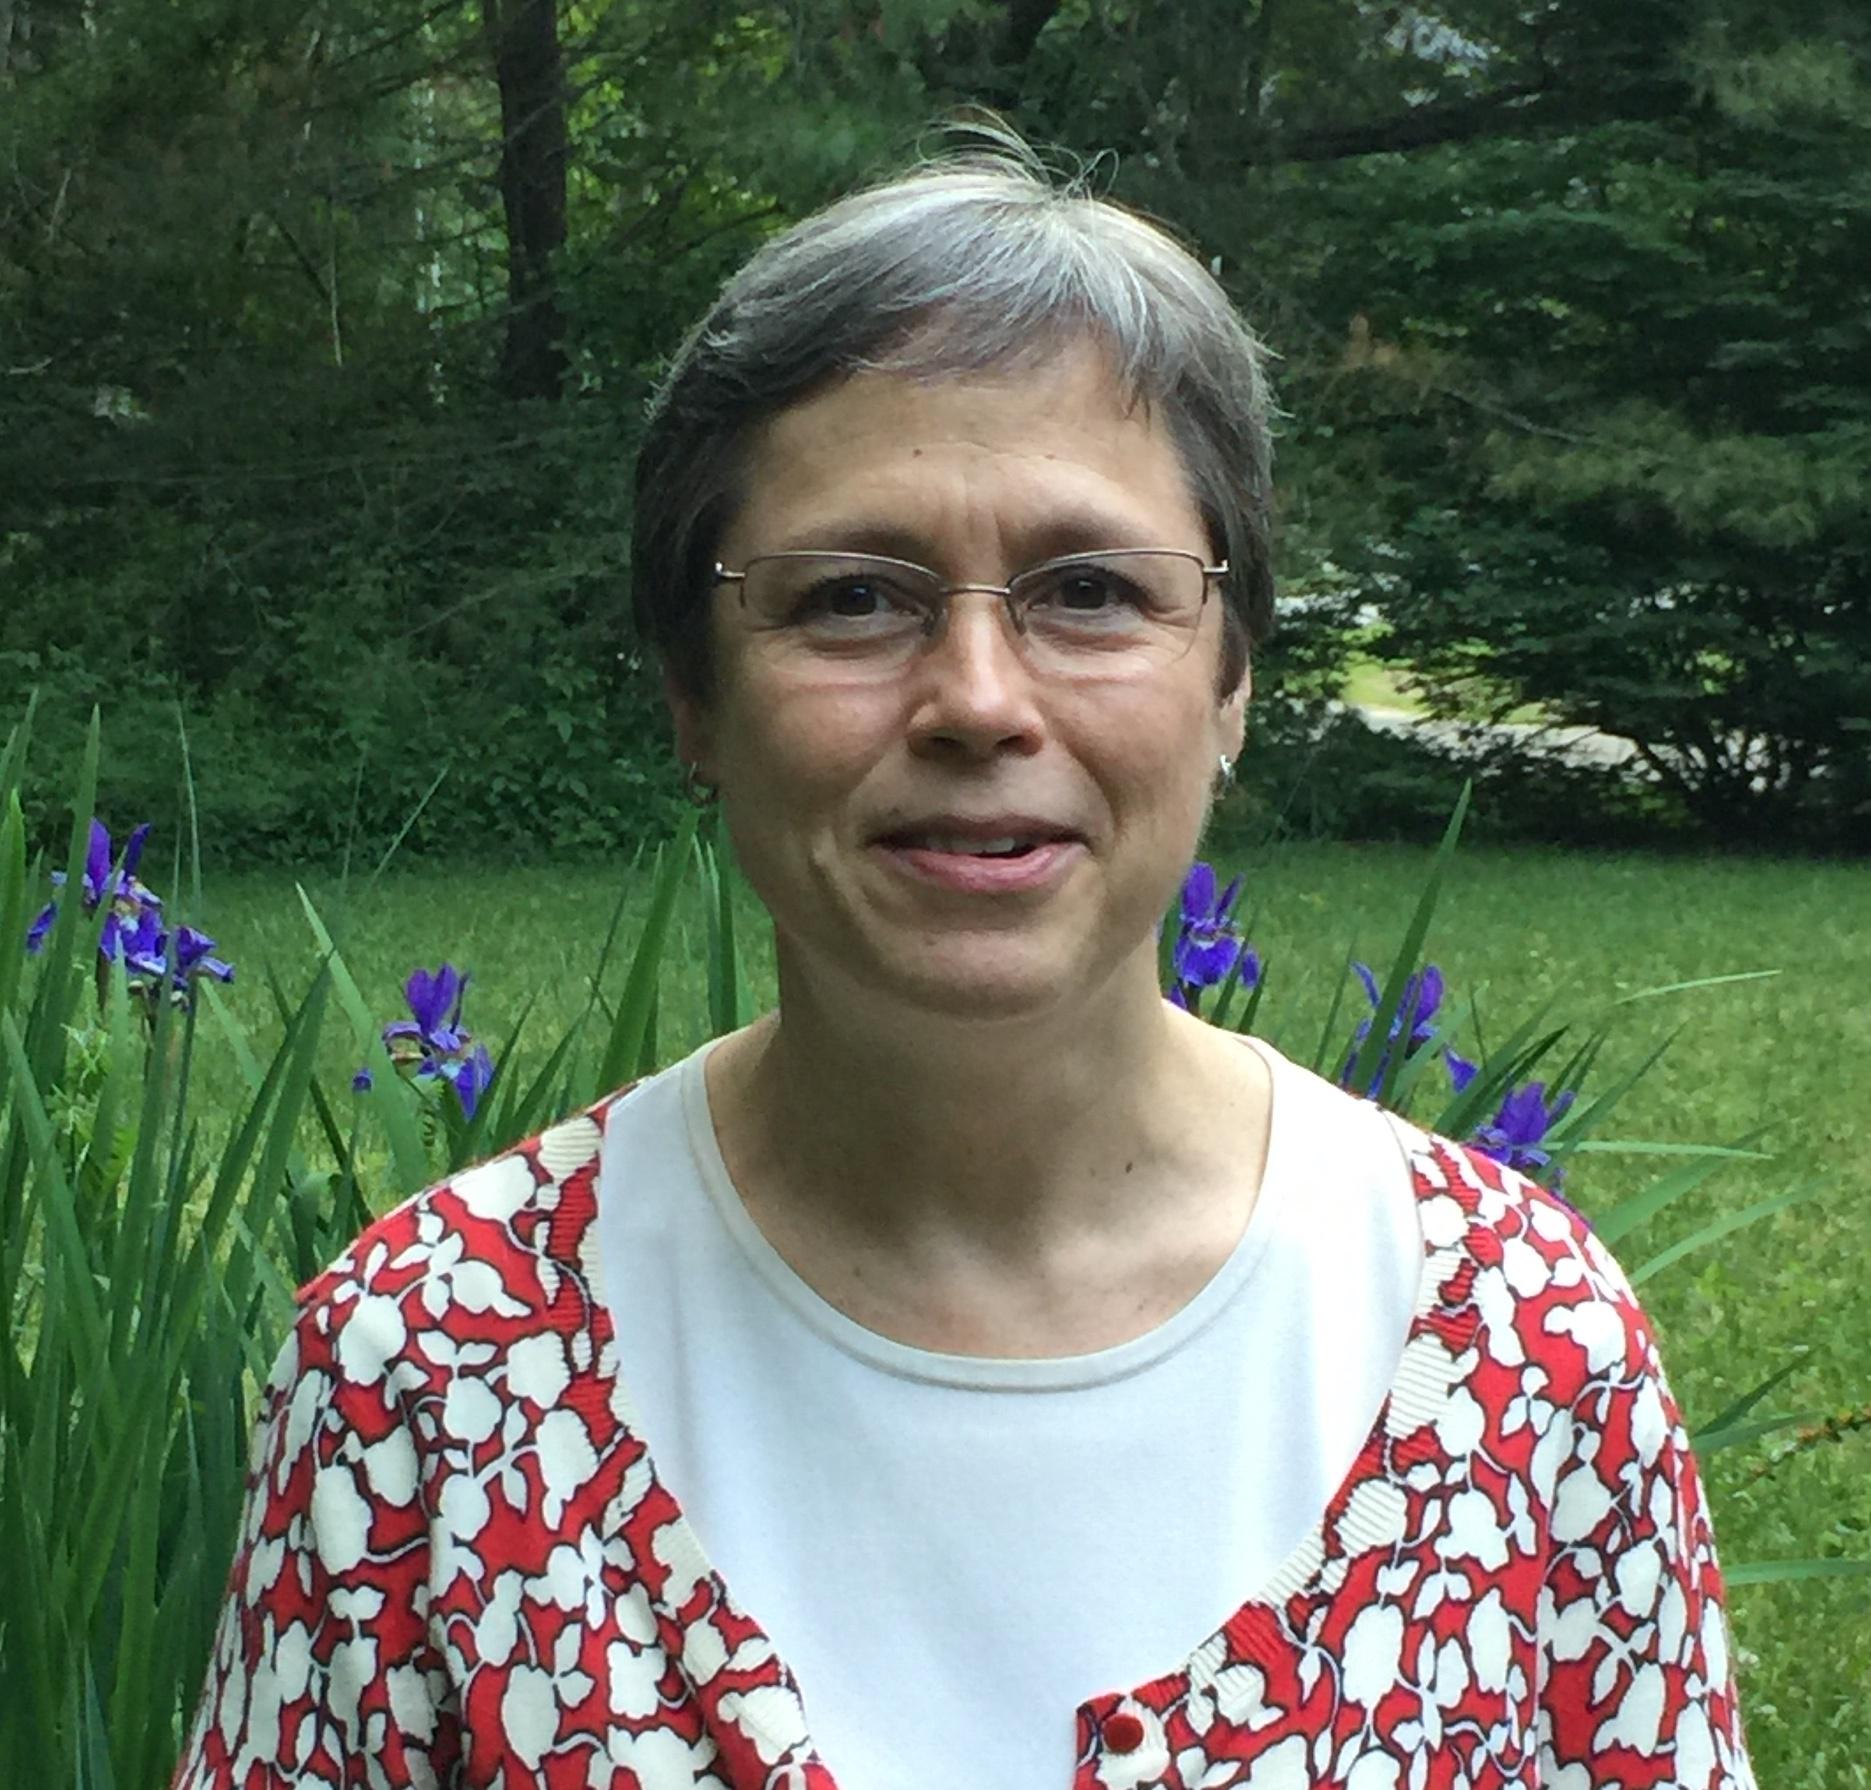 Guest Author: Lynne S. Herrman